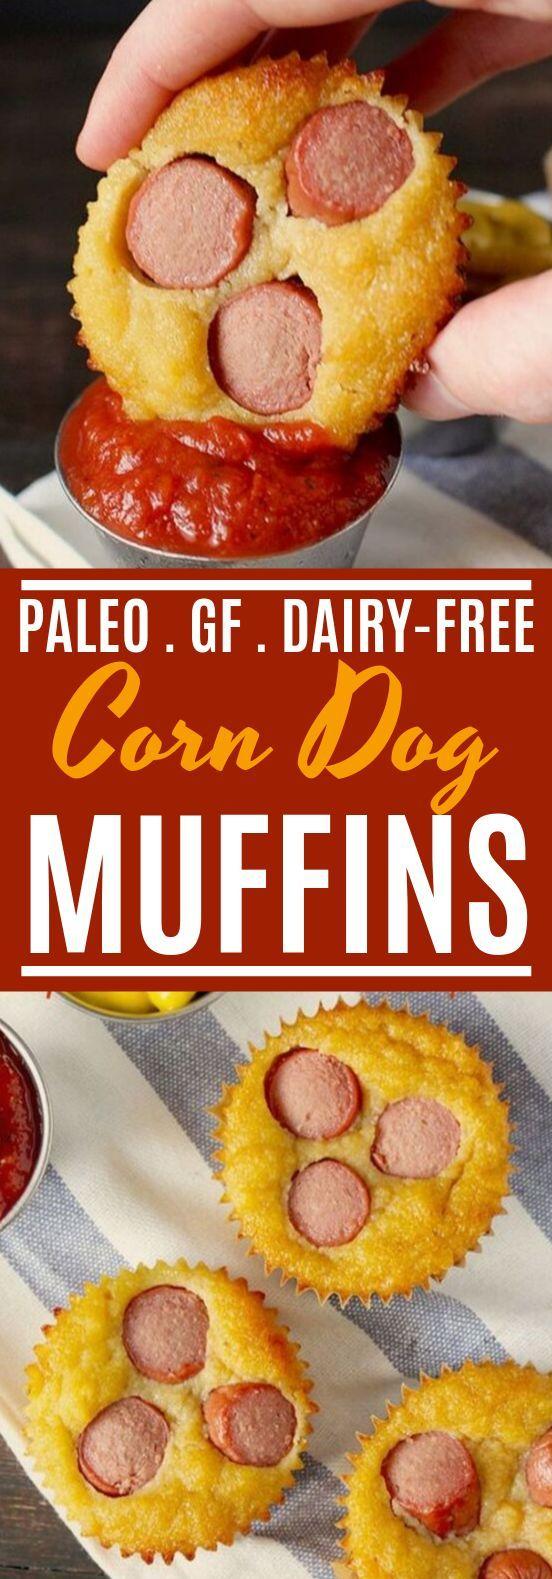 Paleo Corn Dog Muffins #paleo #breakfast #insurancequotes